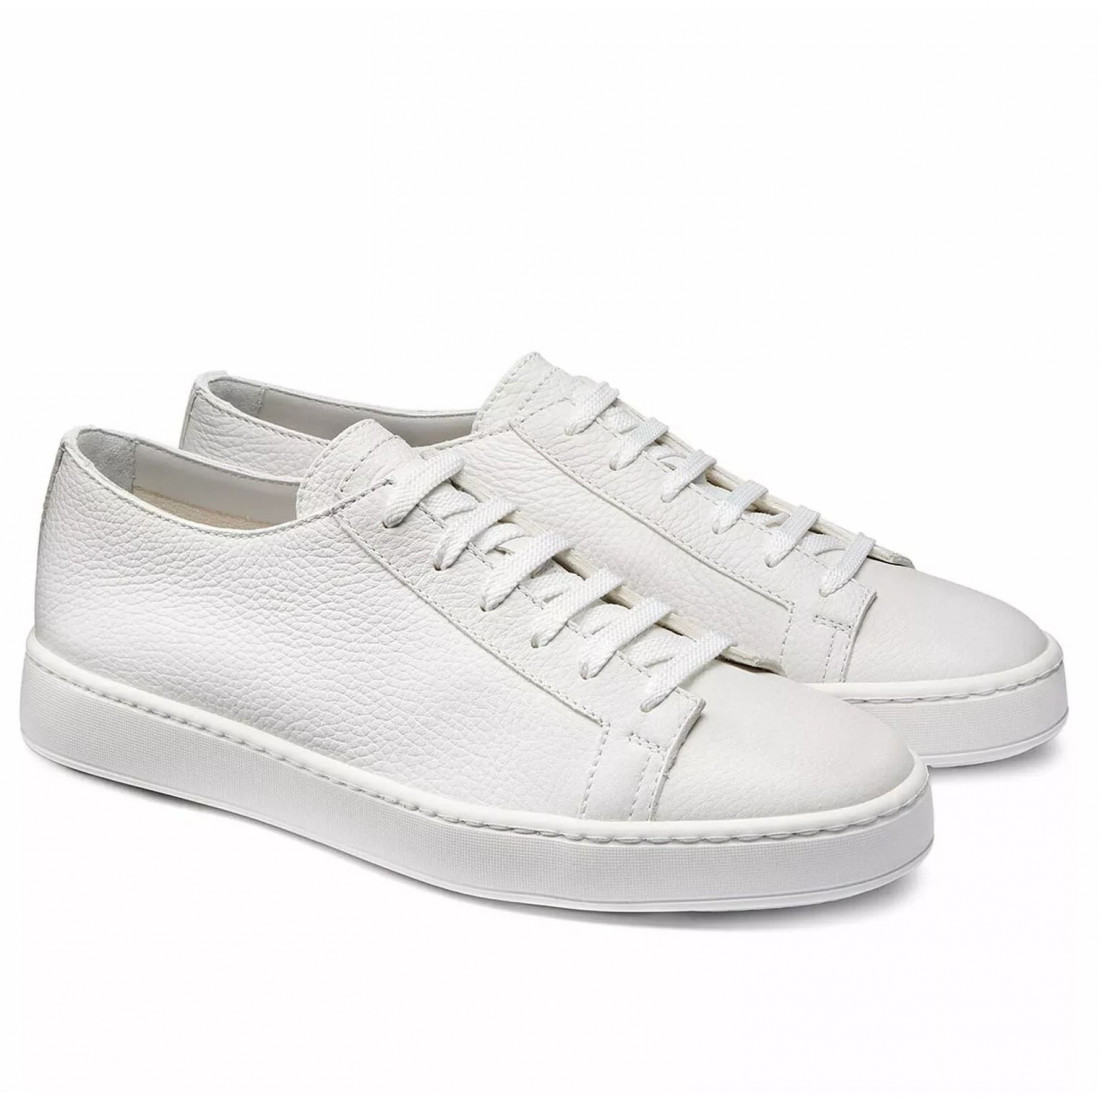 sneakers uomo santoni mbcn14387barcmi48summer i48 6829